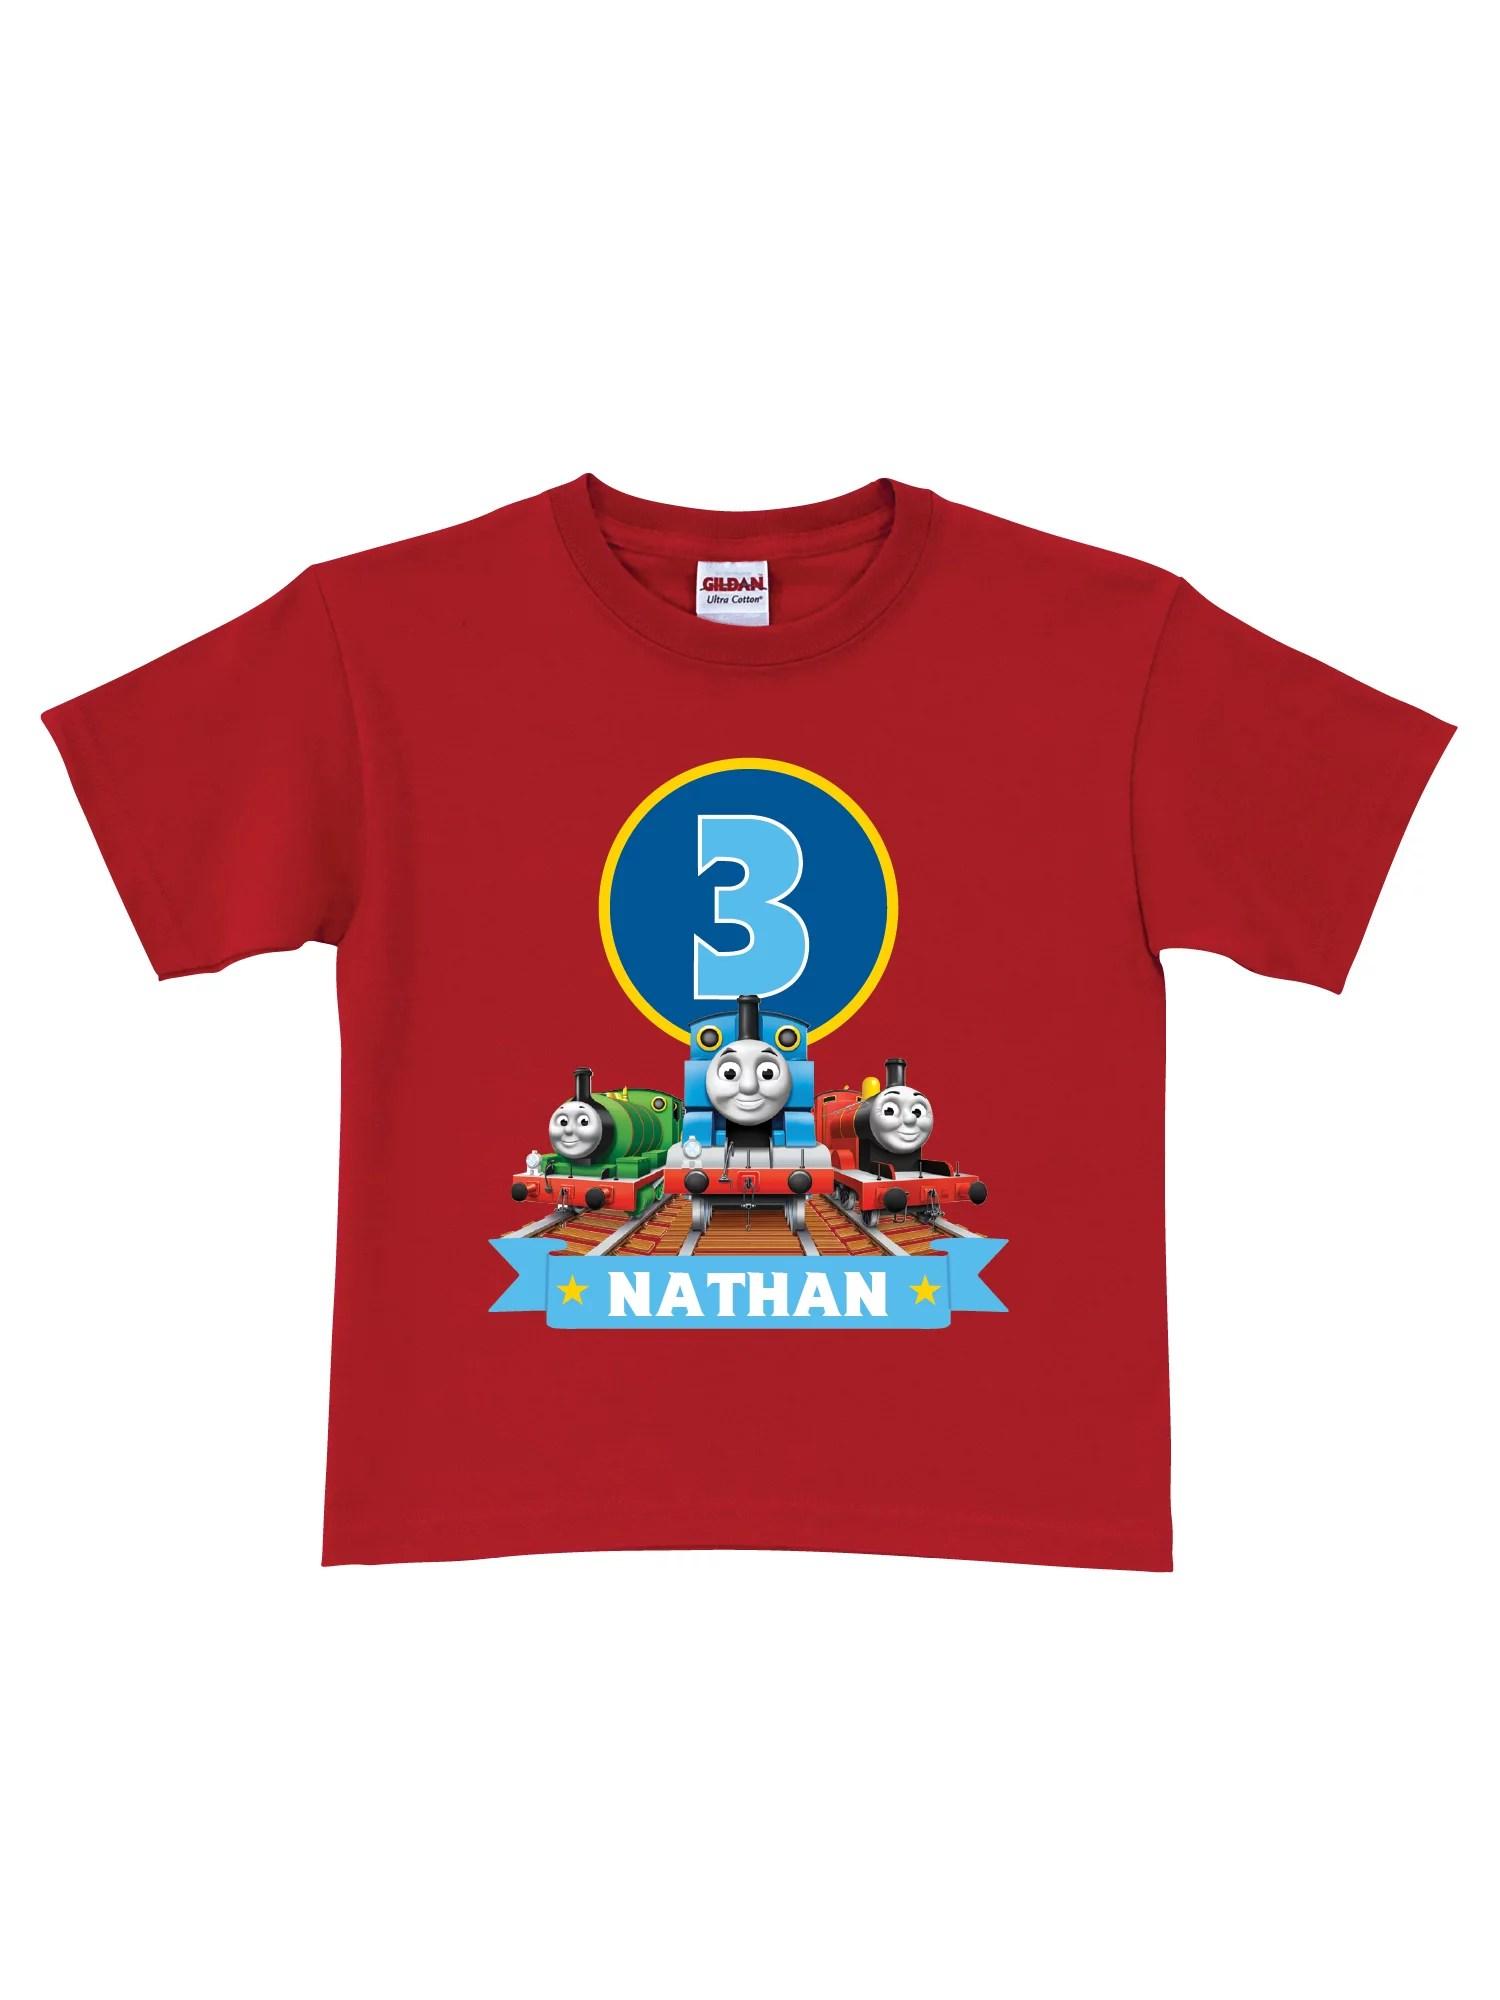 Thomas Friends Personalized Thomas Friends Red Birthday Boys T Shirt In Sizes 2t 3t 4t 5 6t Walmart Com Walmart Com